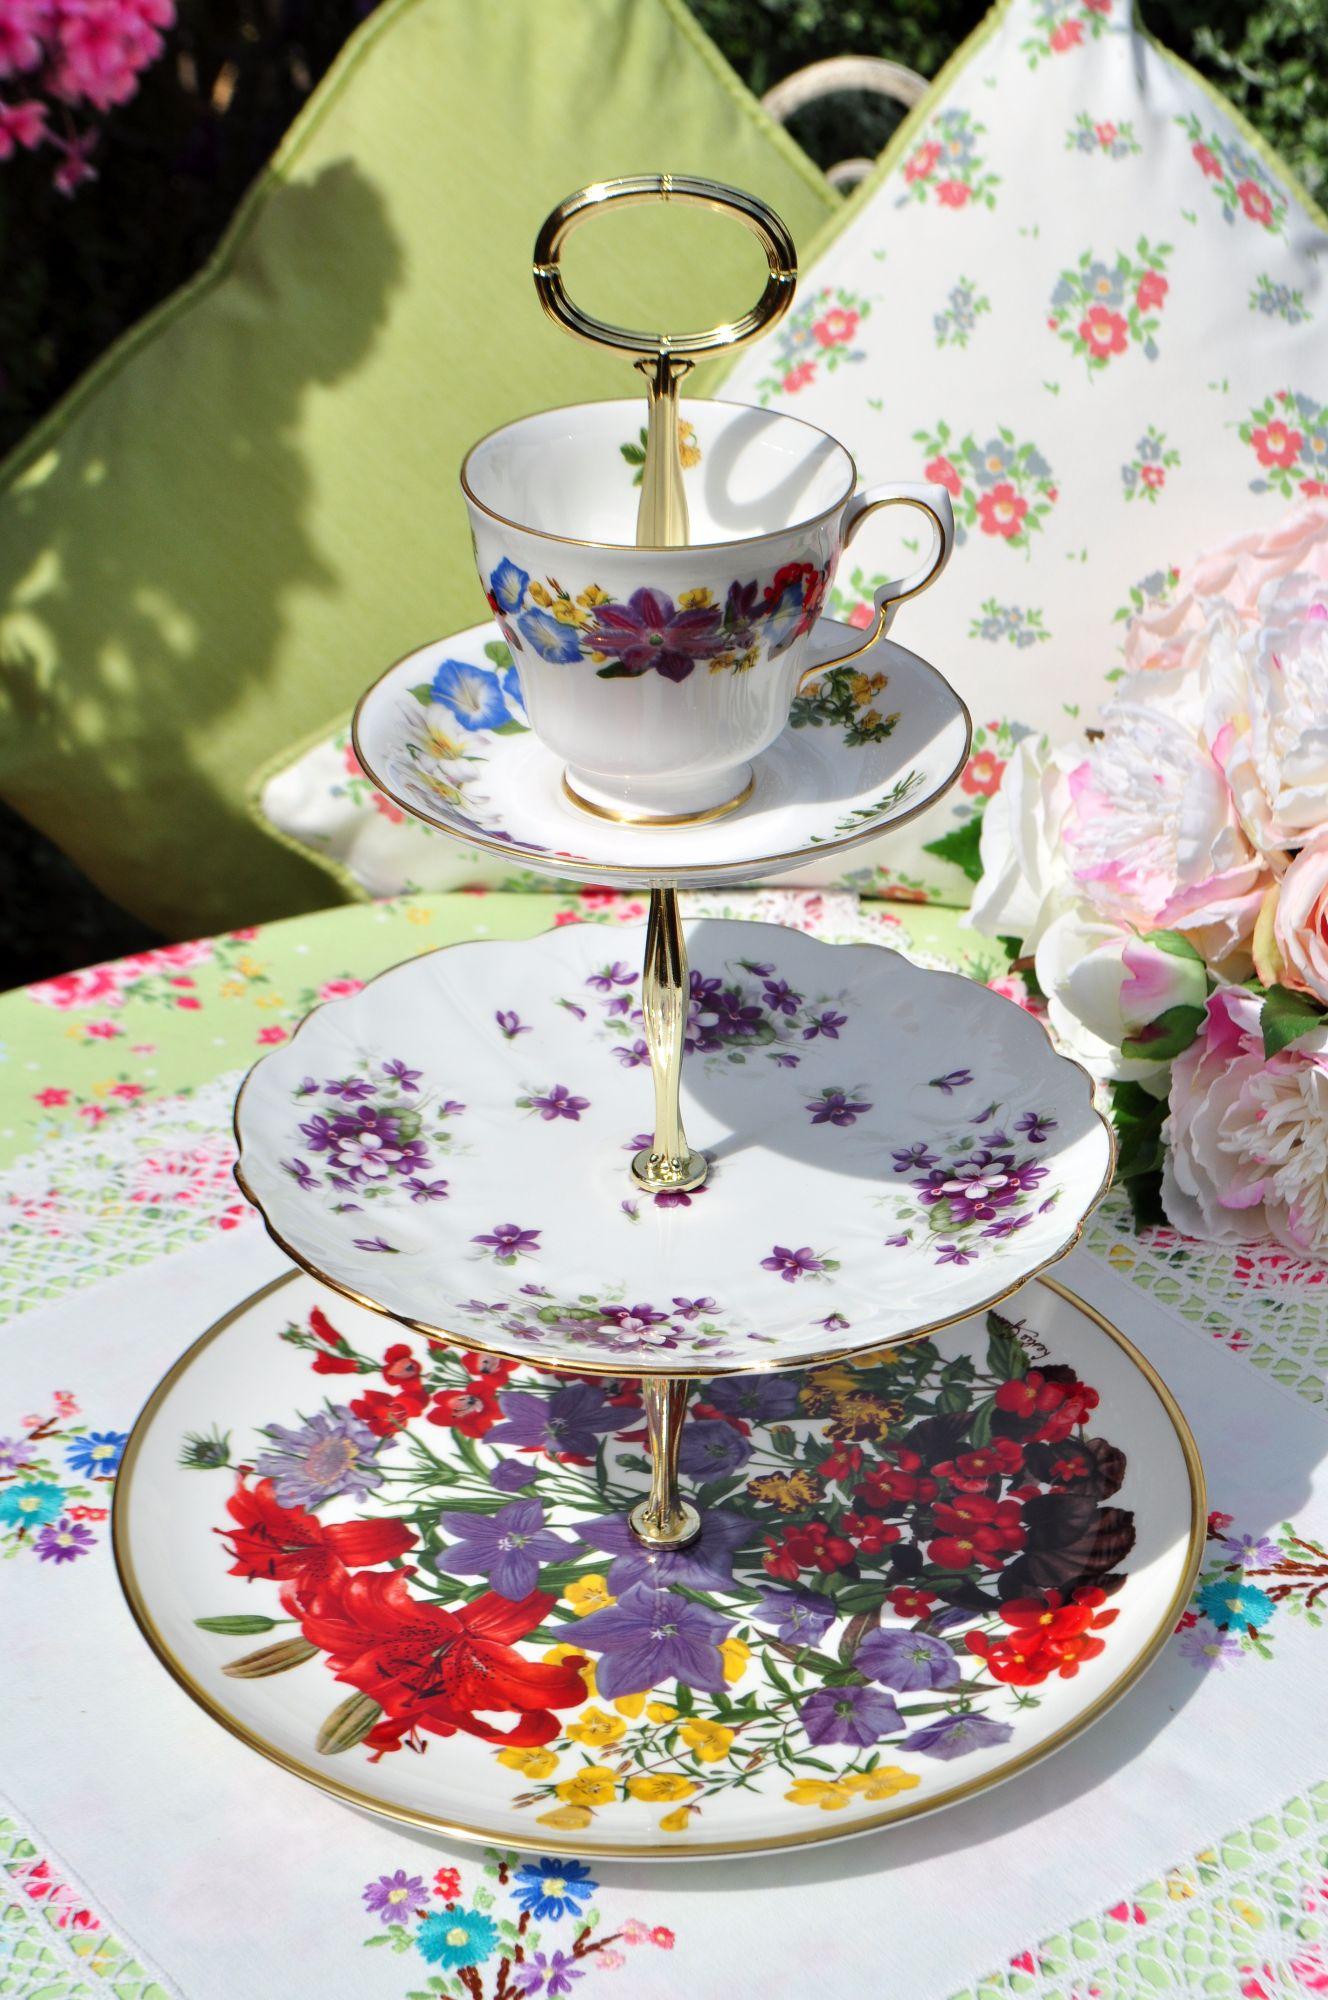 Violette Teacup Top Mismatched 3 Tier Cake Stand